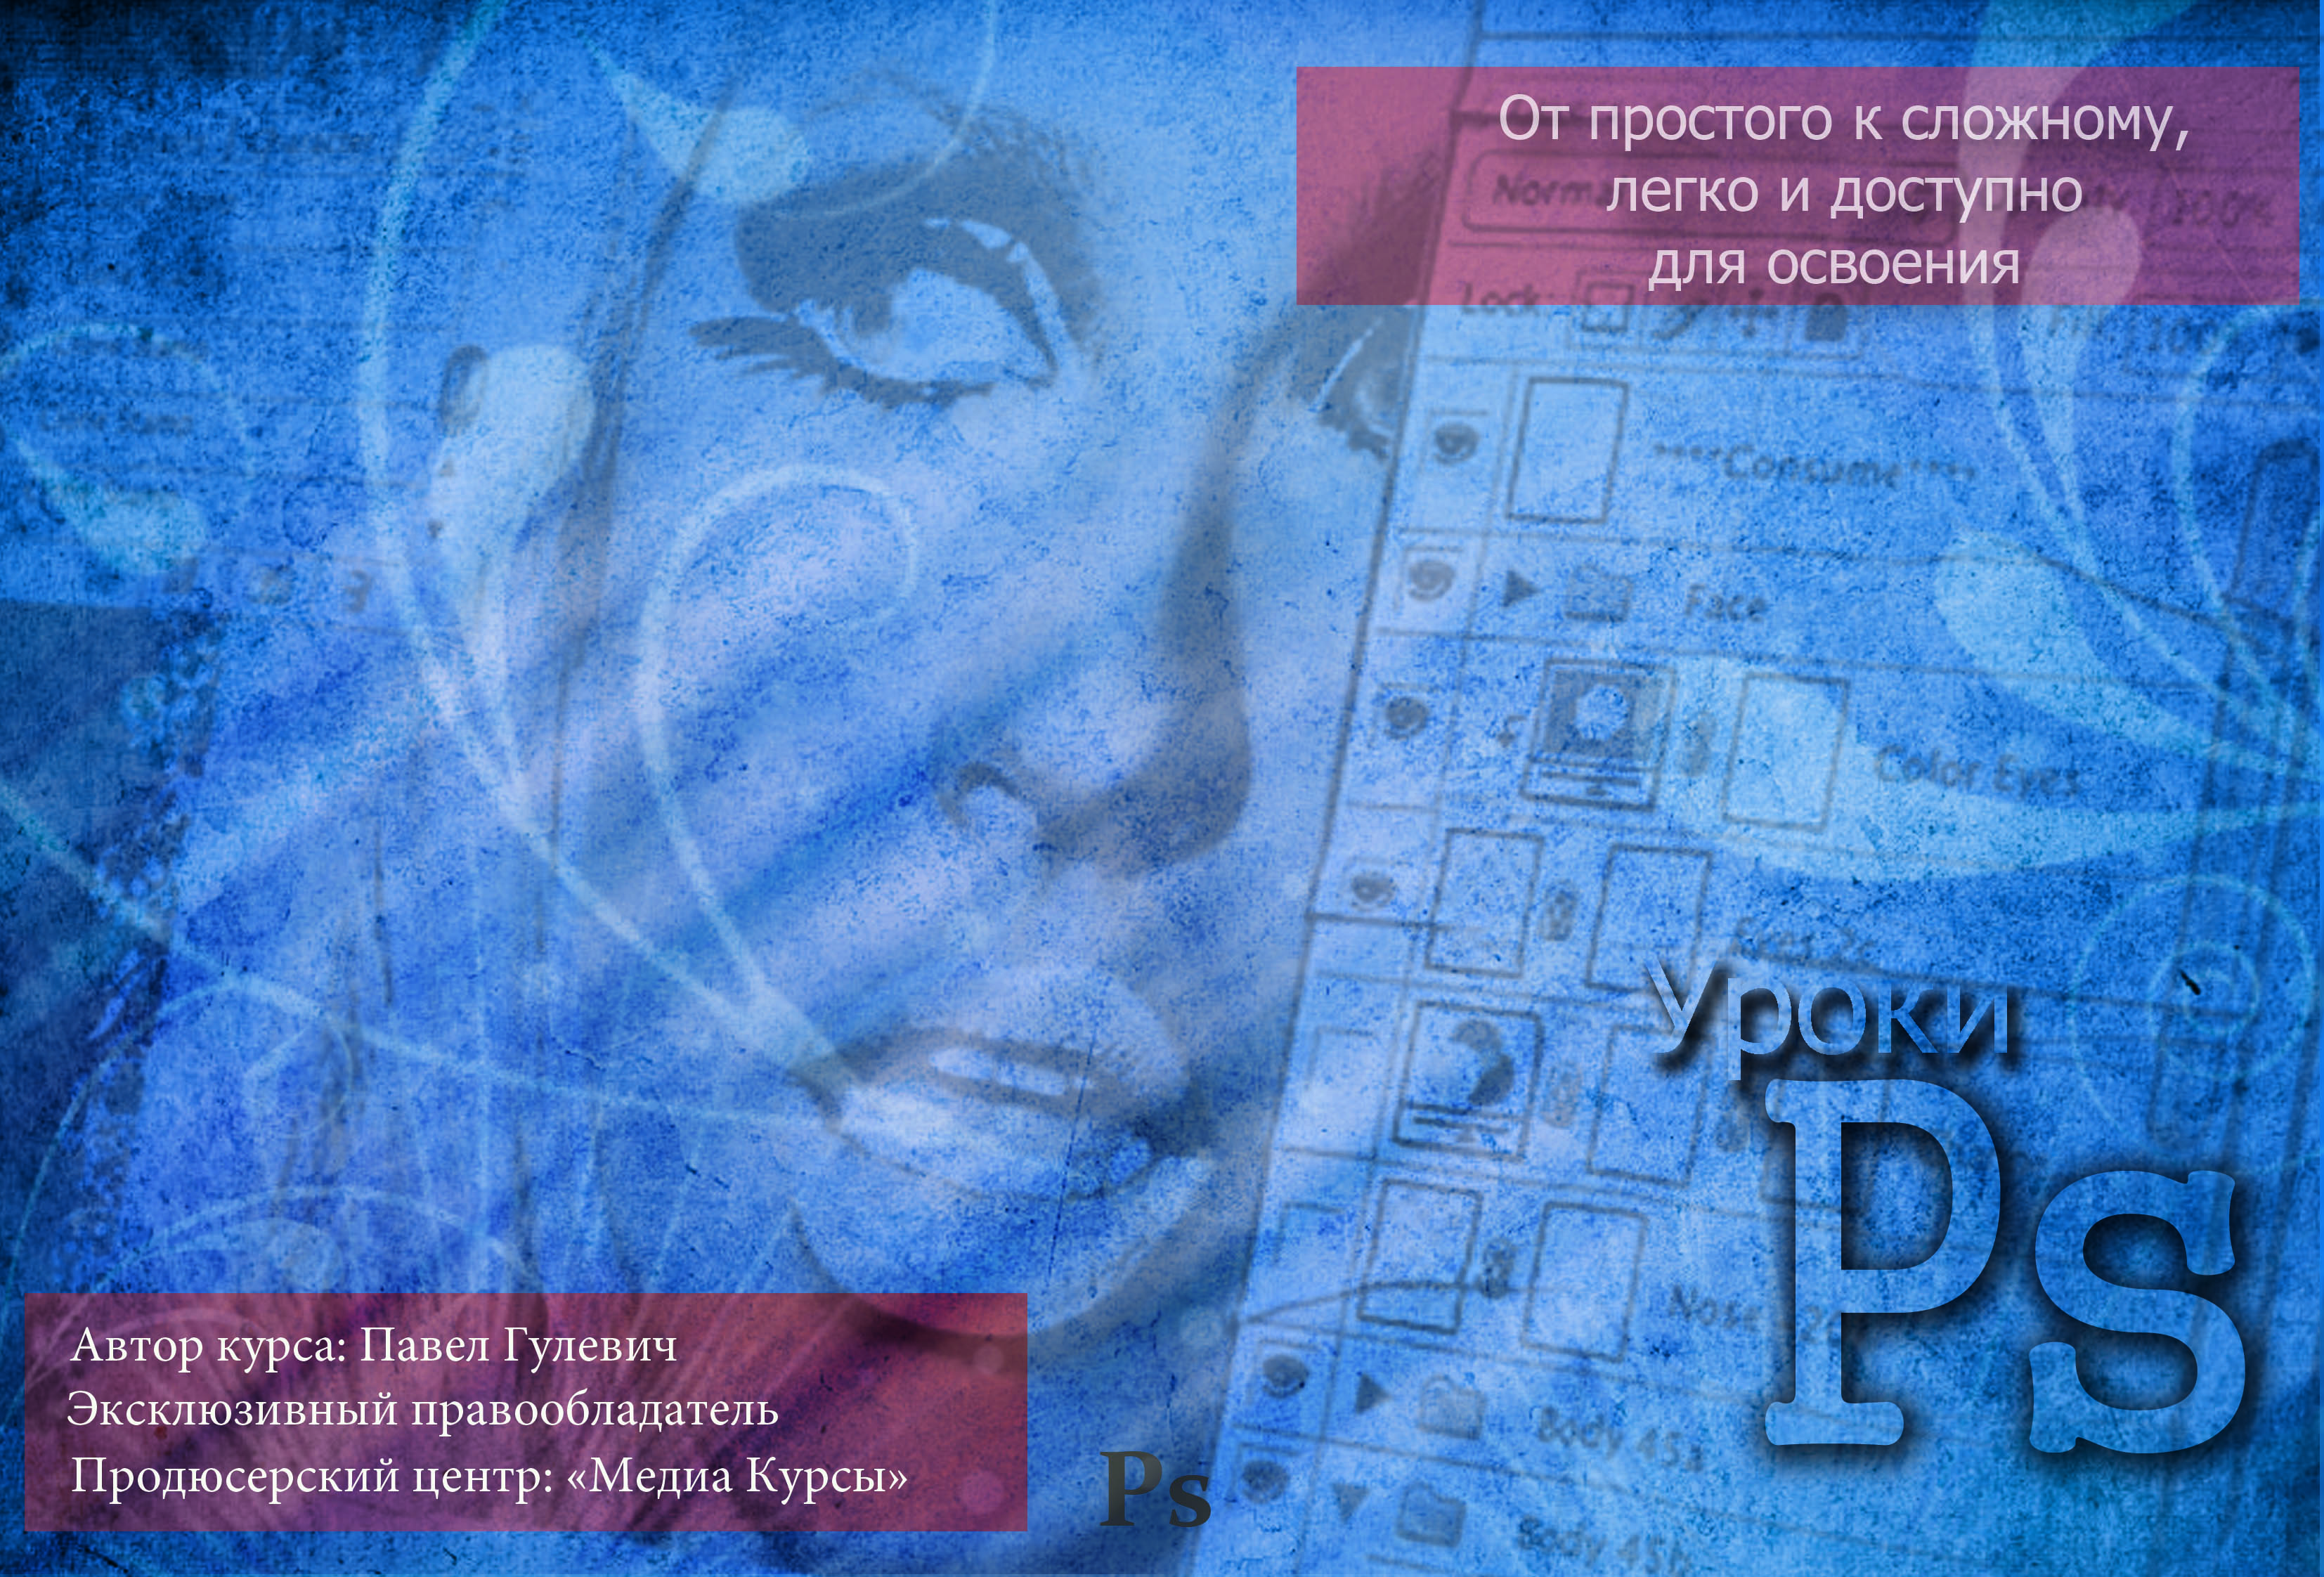 Создание дизайна DVD релиза (обложка, накатка, меню и т.п.) фото f_4d8c5157e7c9e.jpg